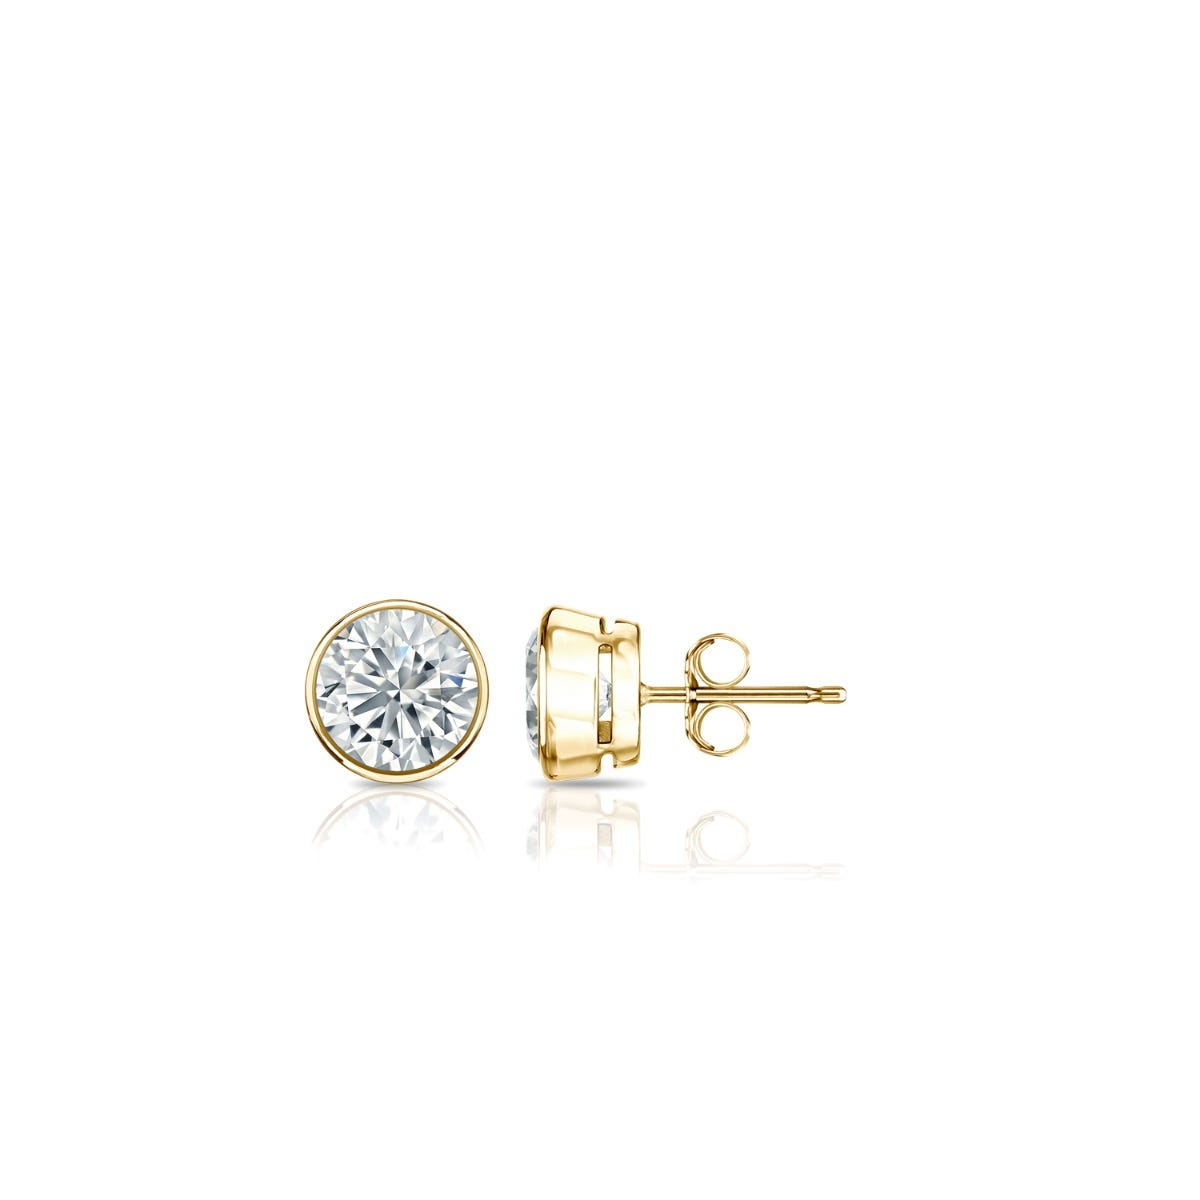 Diamond Round Bezel-Set 1/10ctw. Solitaire Stud (IJ-SI1) Earrings in 18K Yellow Gold